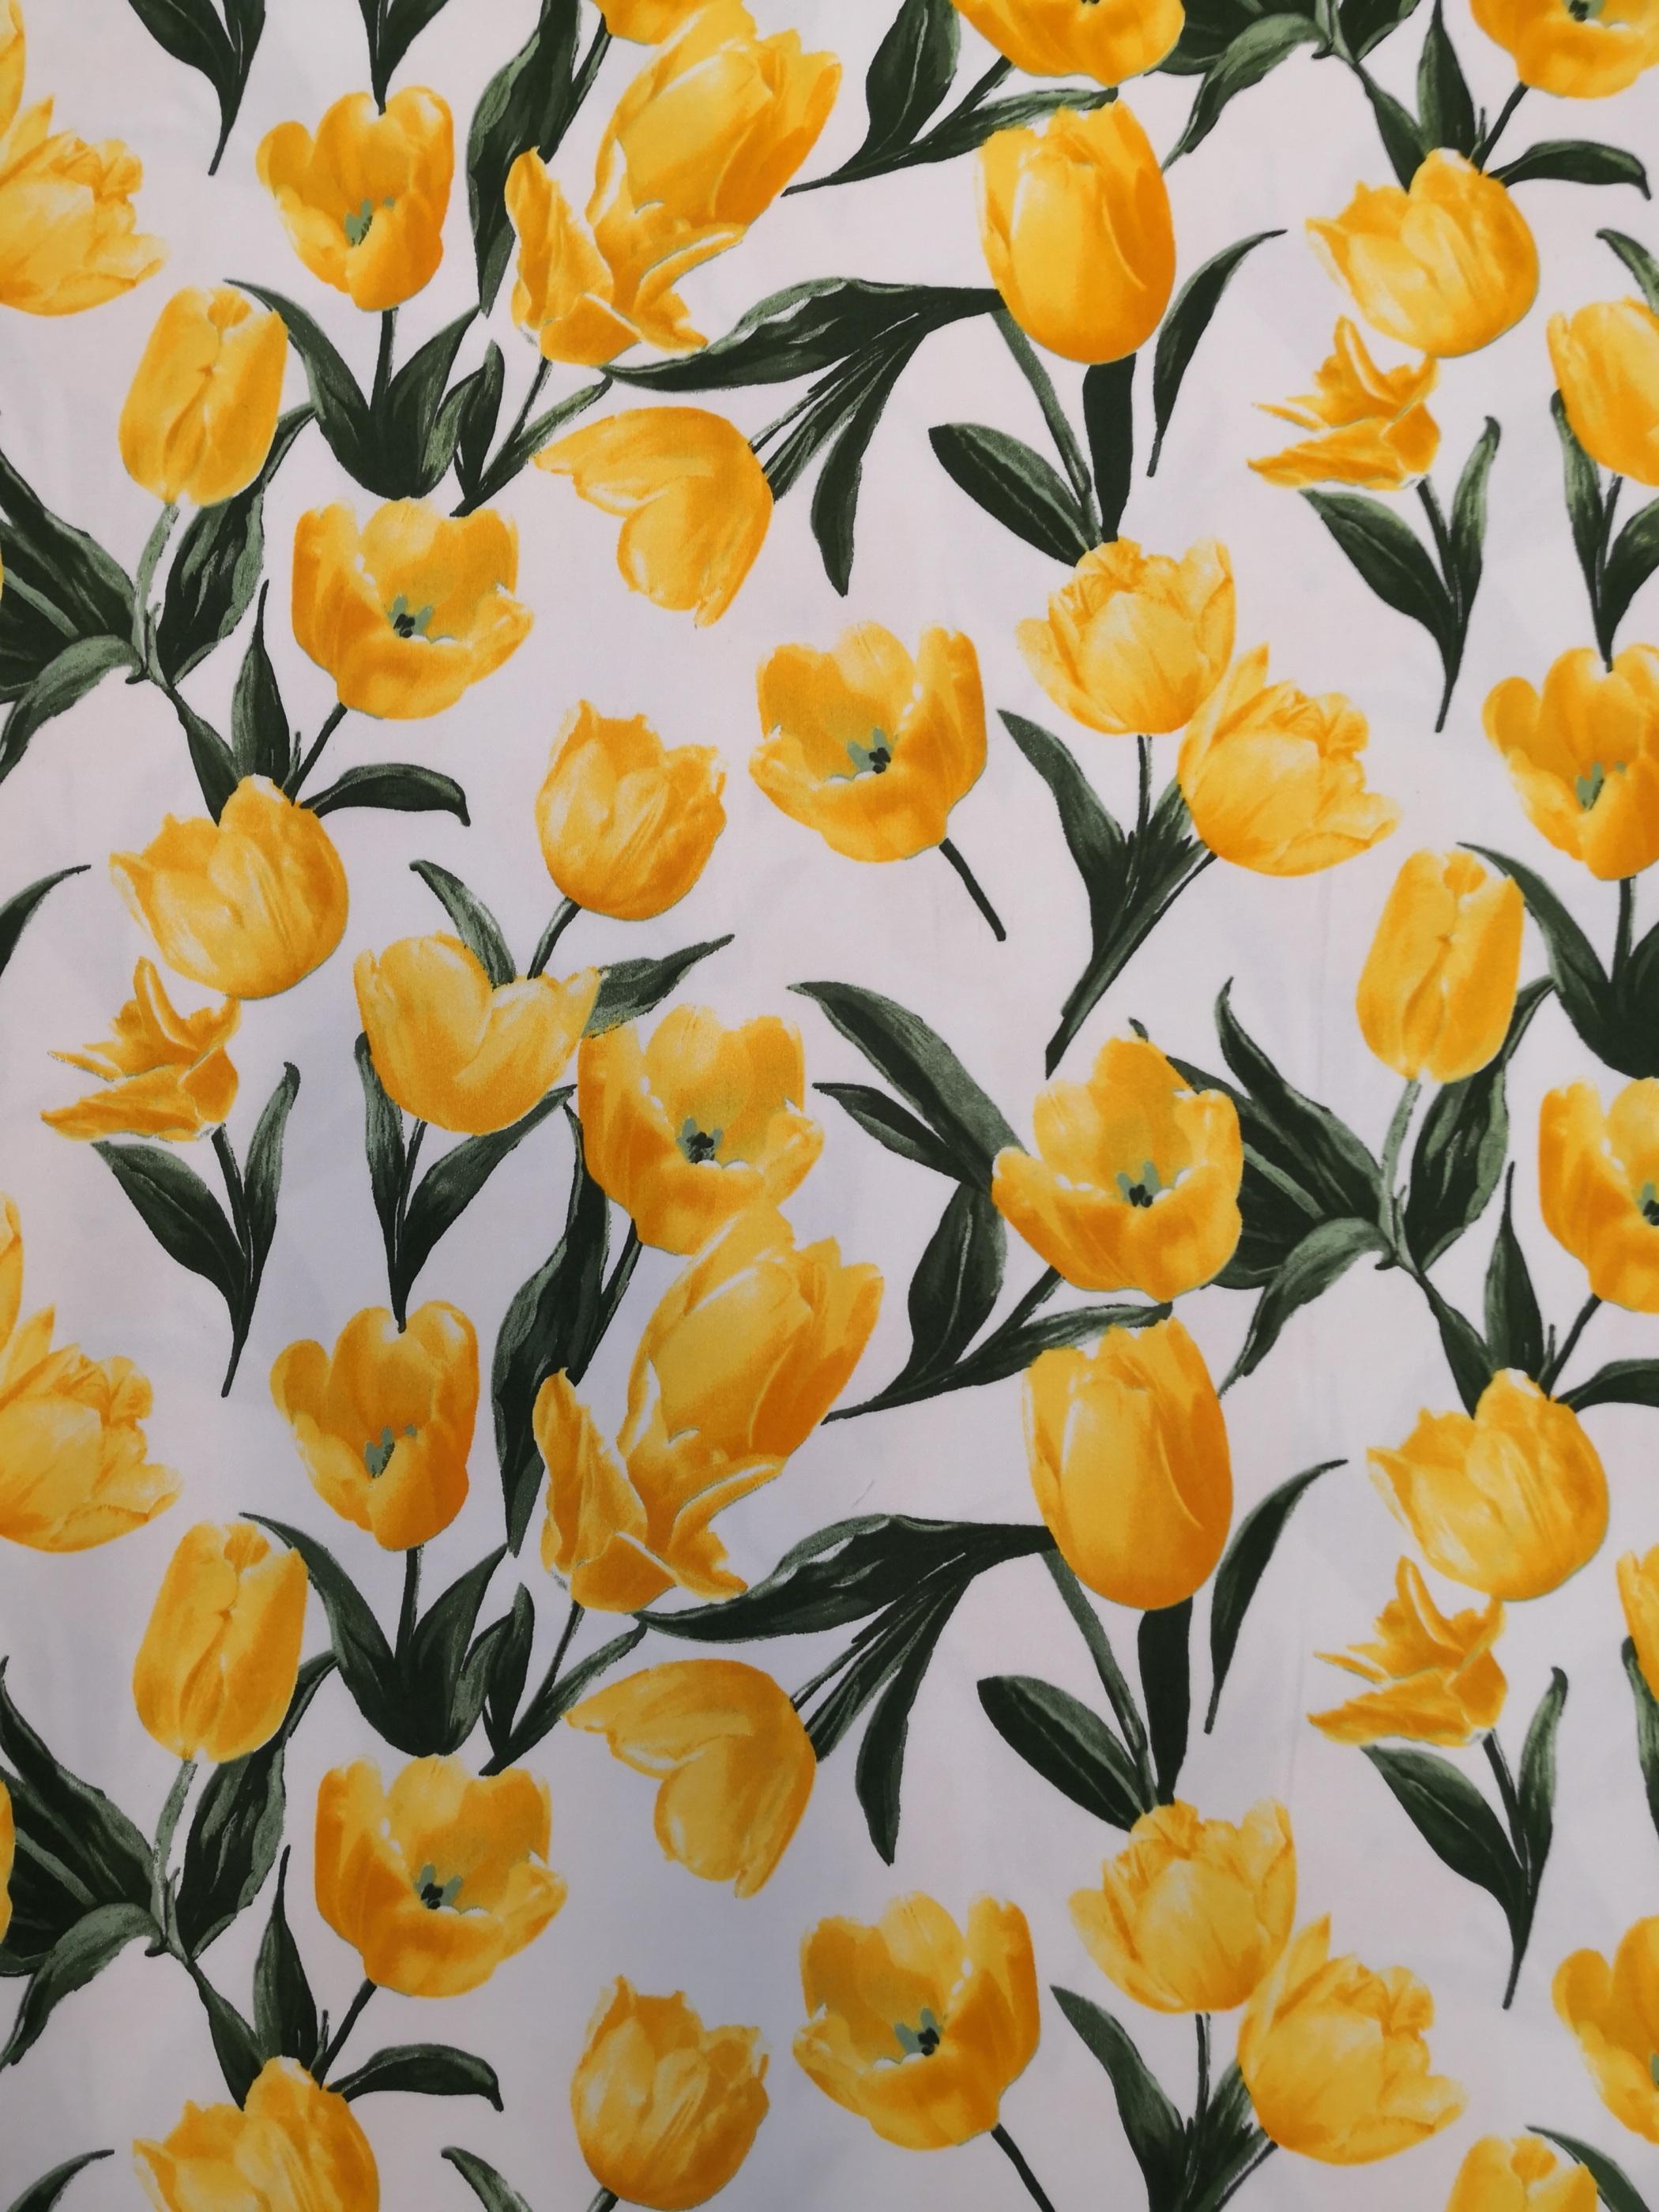 Gul tulpan blomma metervara laholm tyglust modetyg